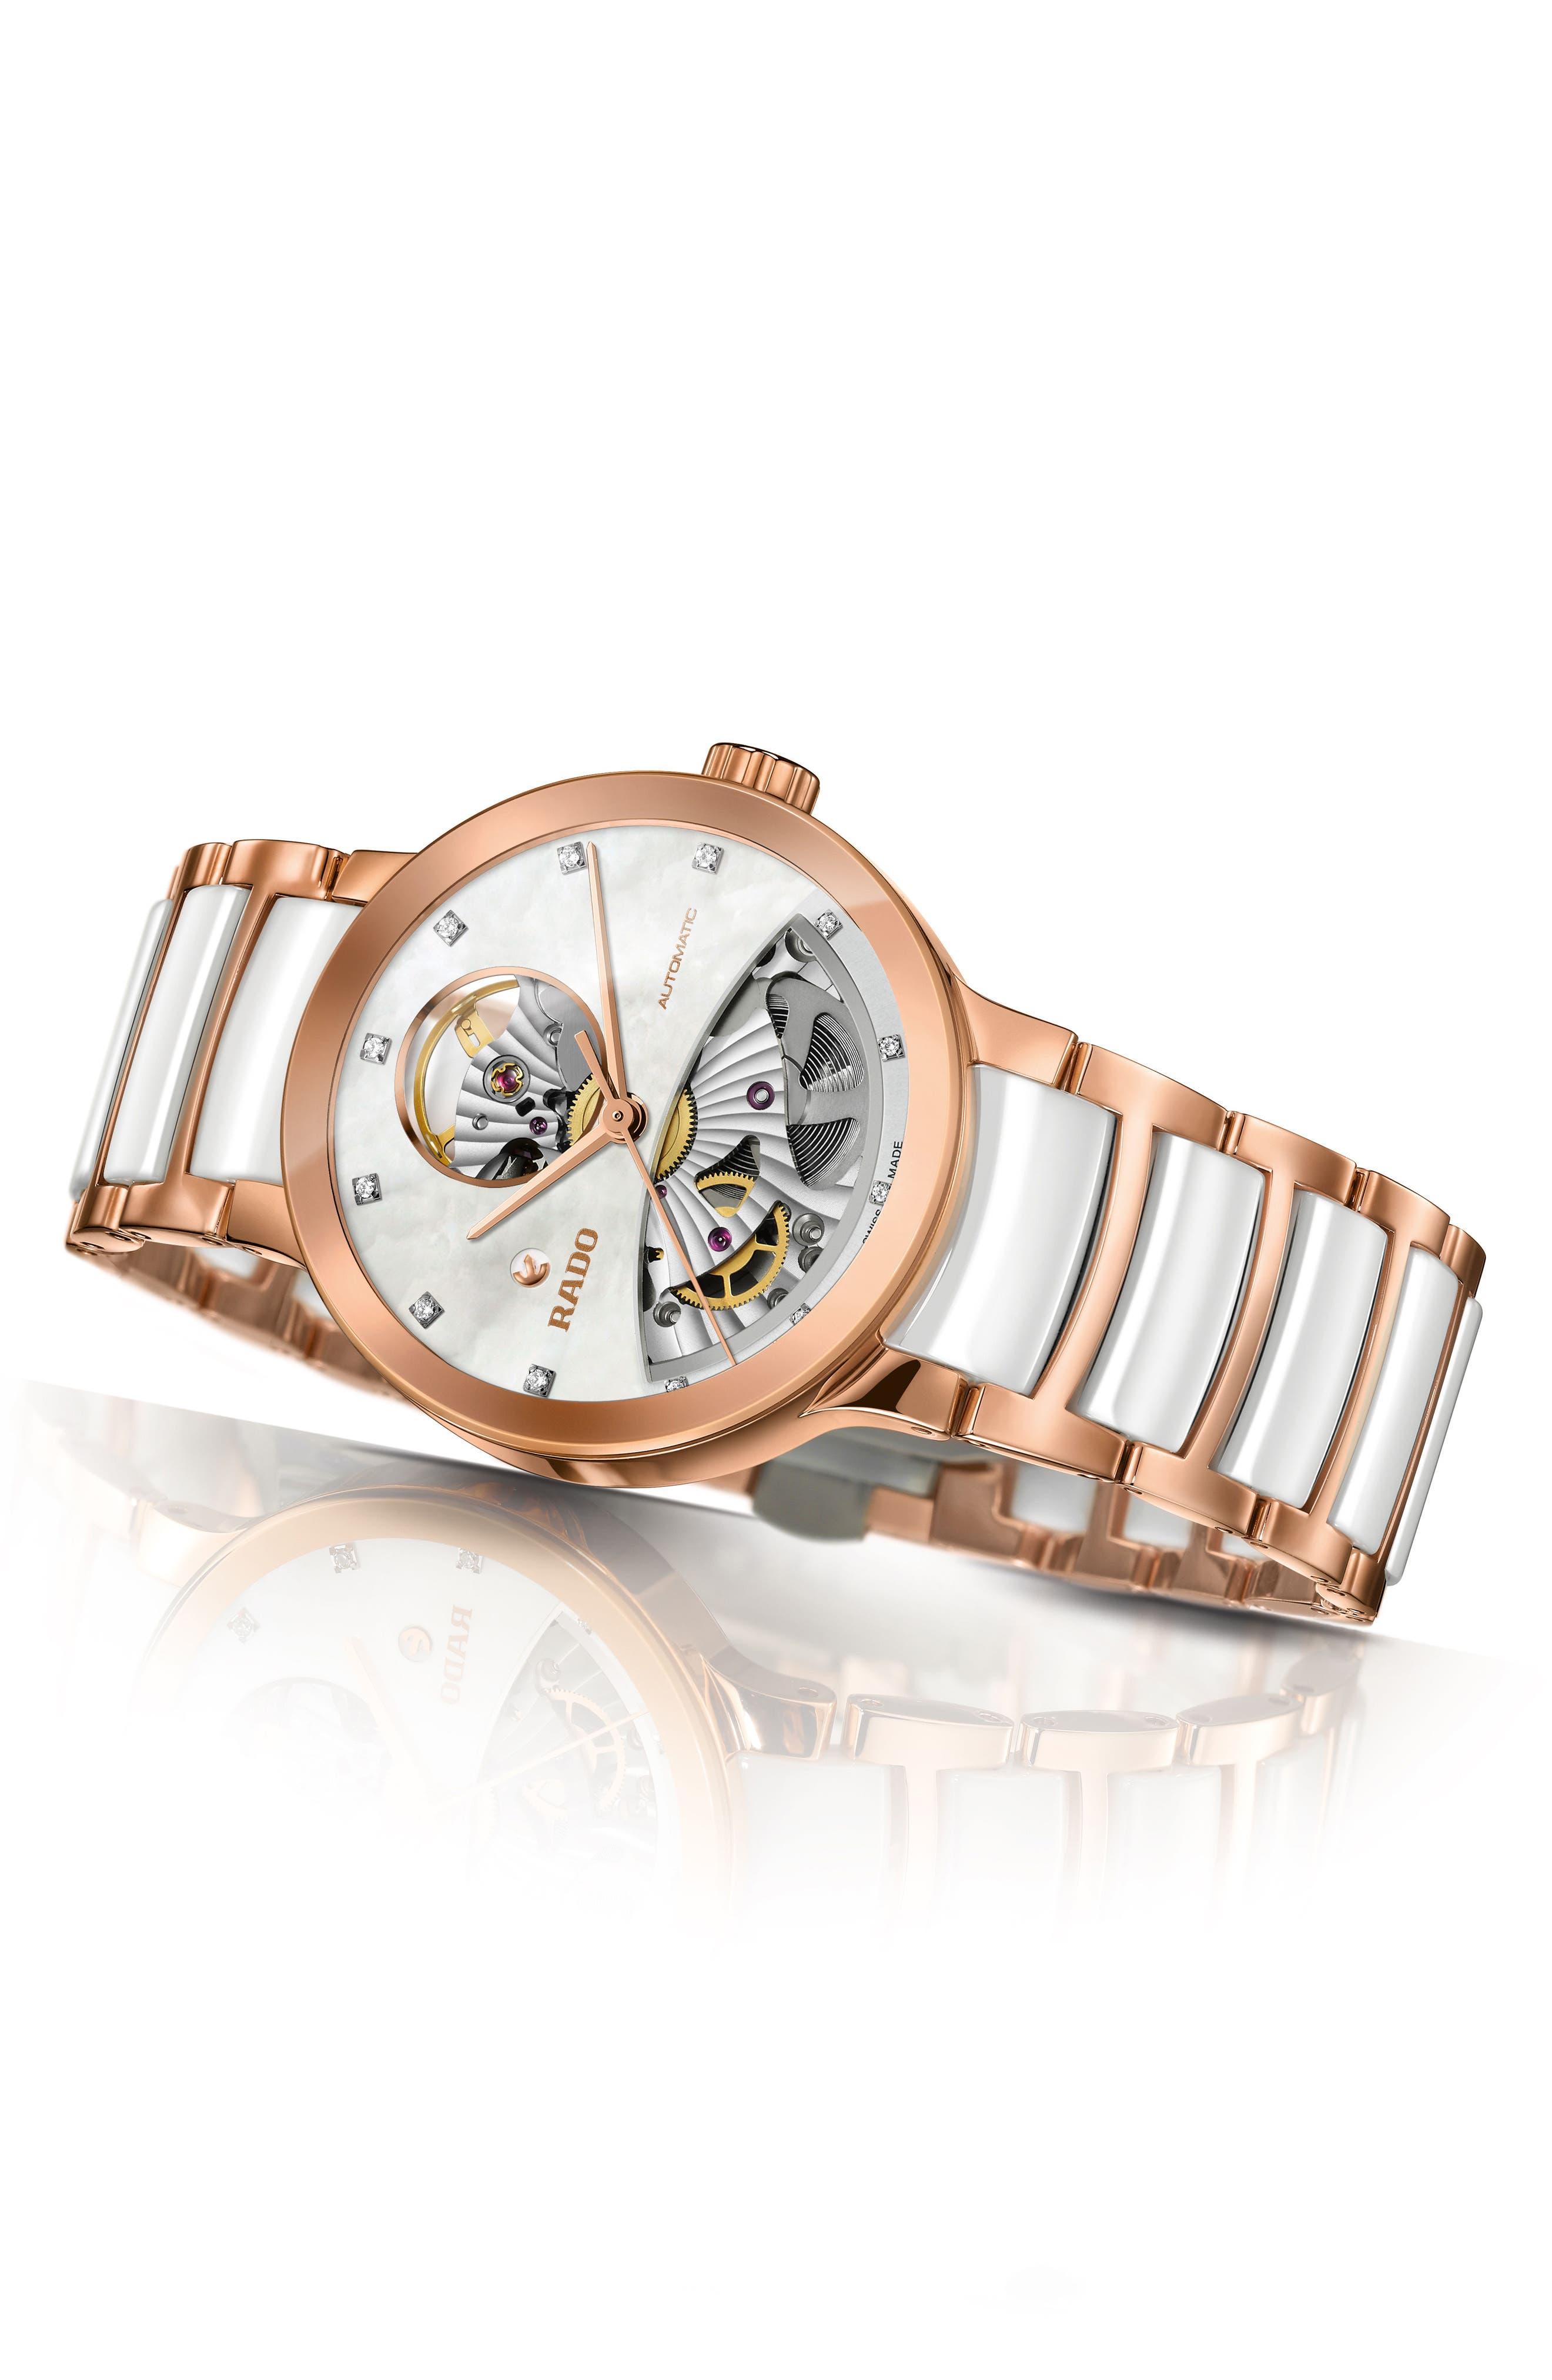 RADO,                             Centrix Open Heart Automatic Diamond Ceramic Bracelet Watch, 33mm,                             Alternate thumbnail 3, color,                             WHITE/ MOP/ ROSE GOLD